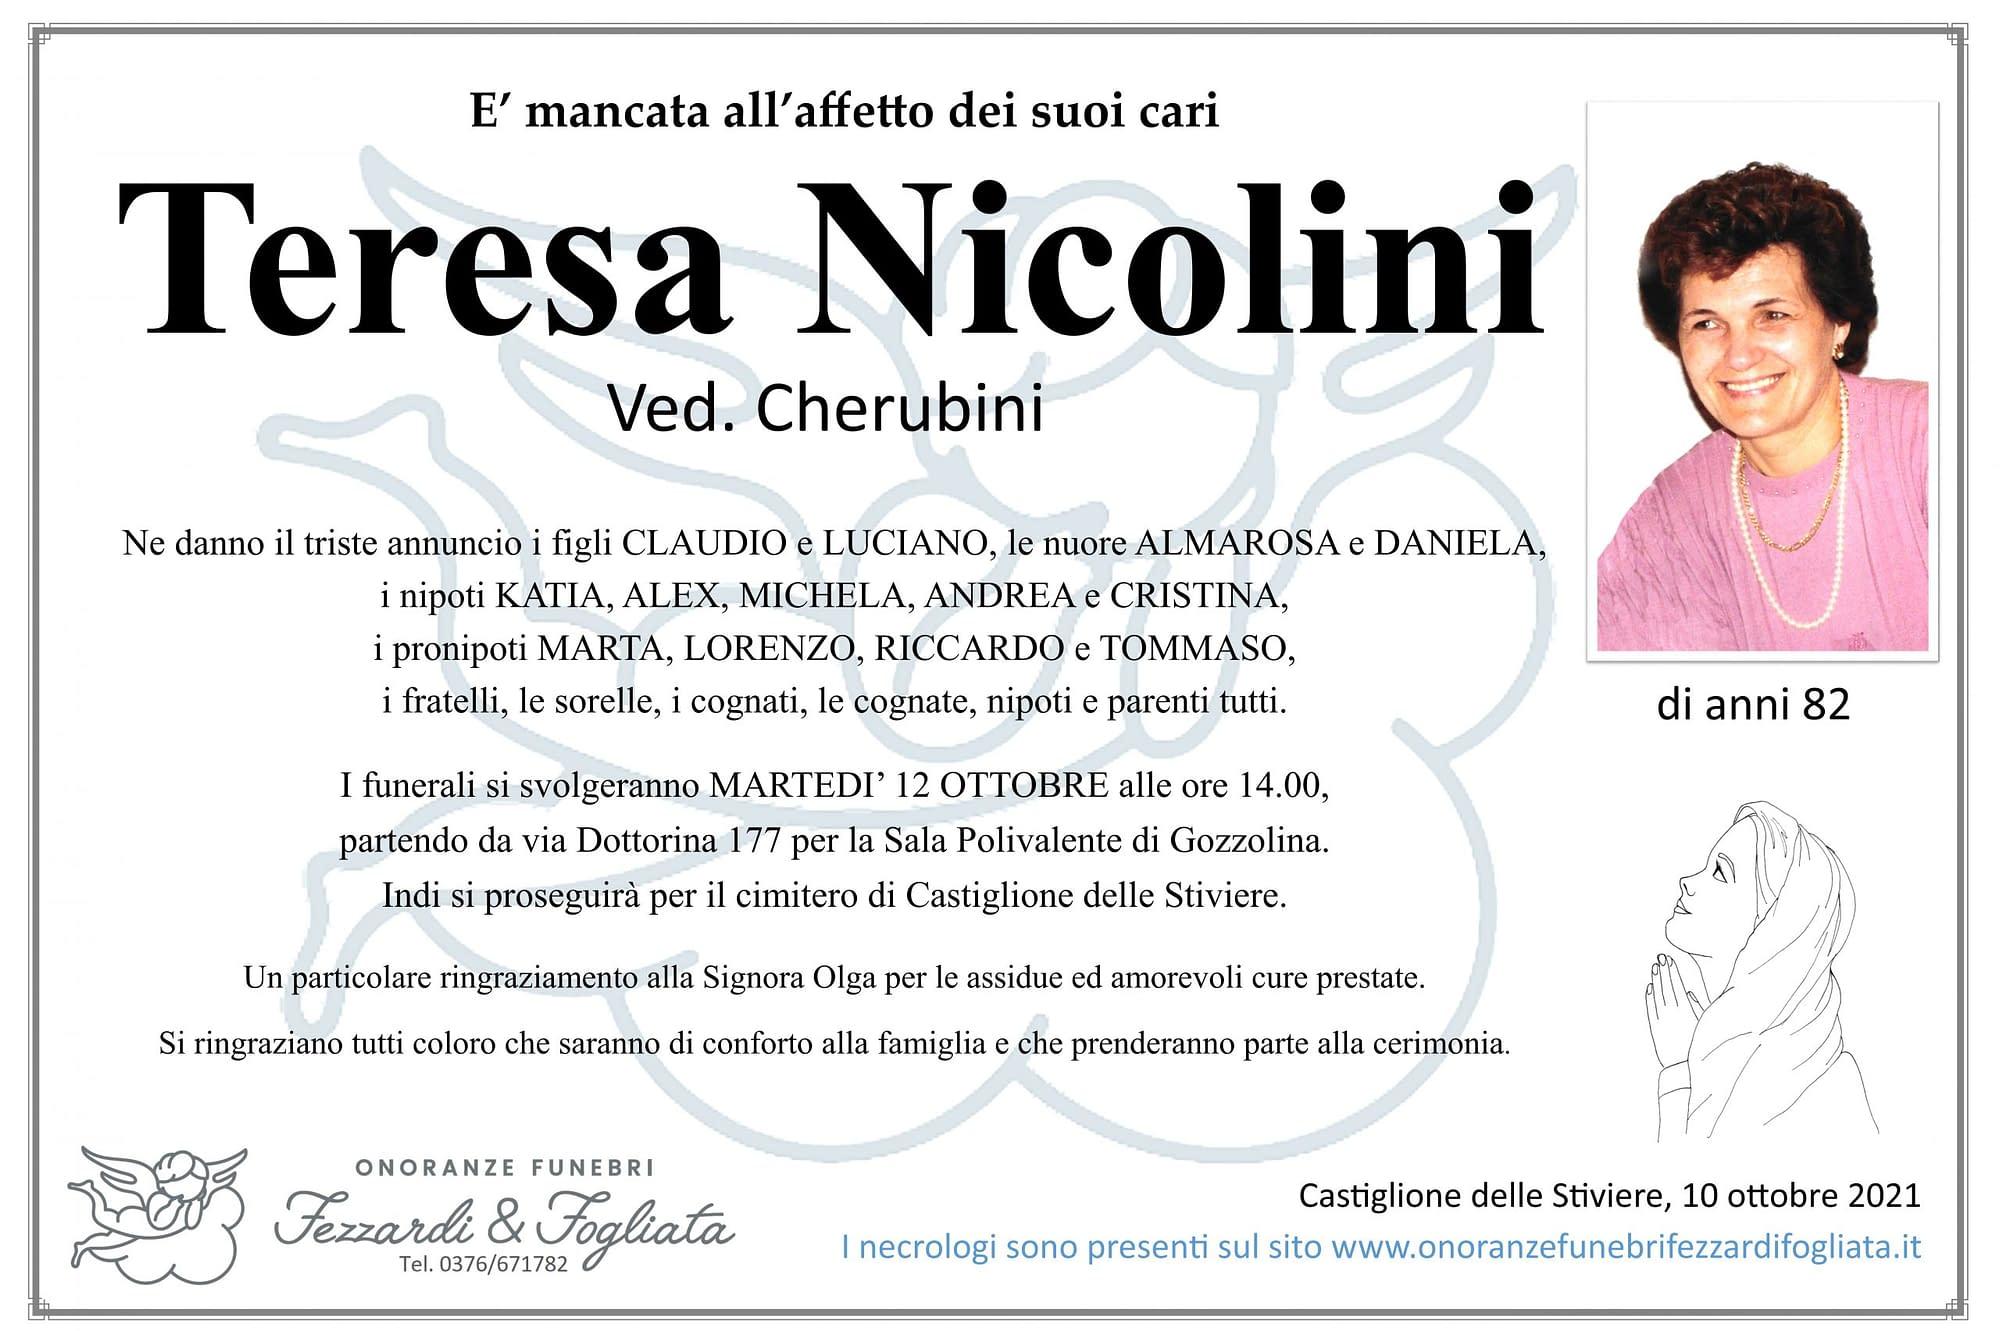 Necrologio Teresa Nicolini ved.Cherubini